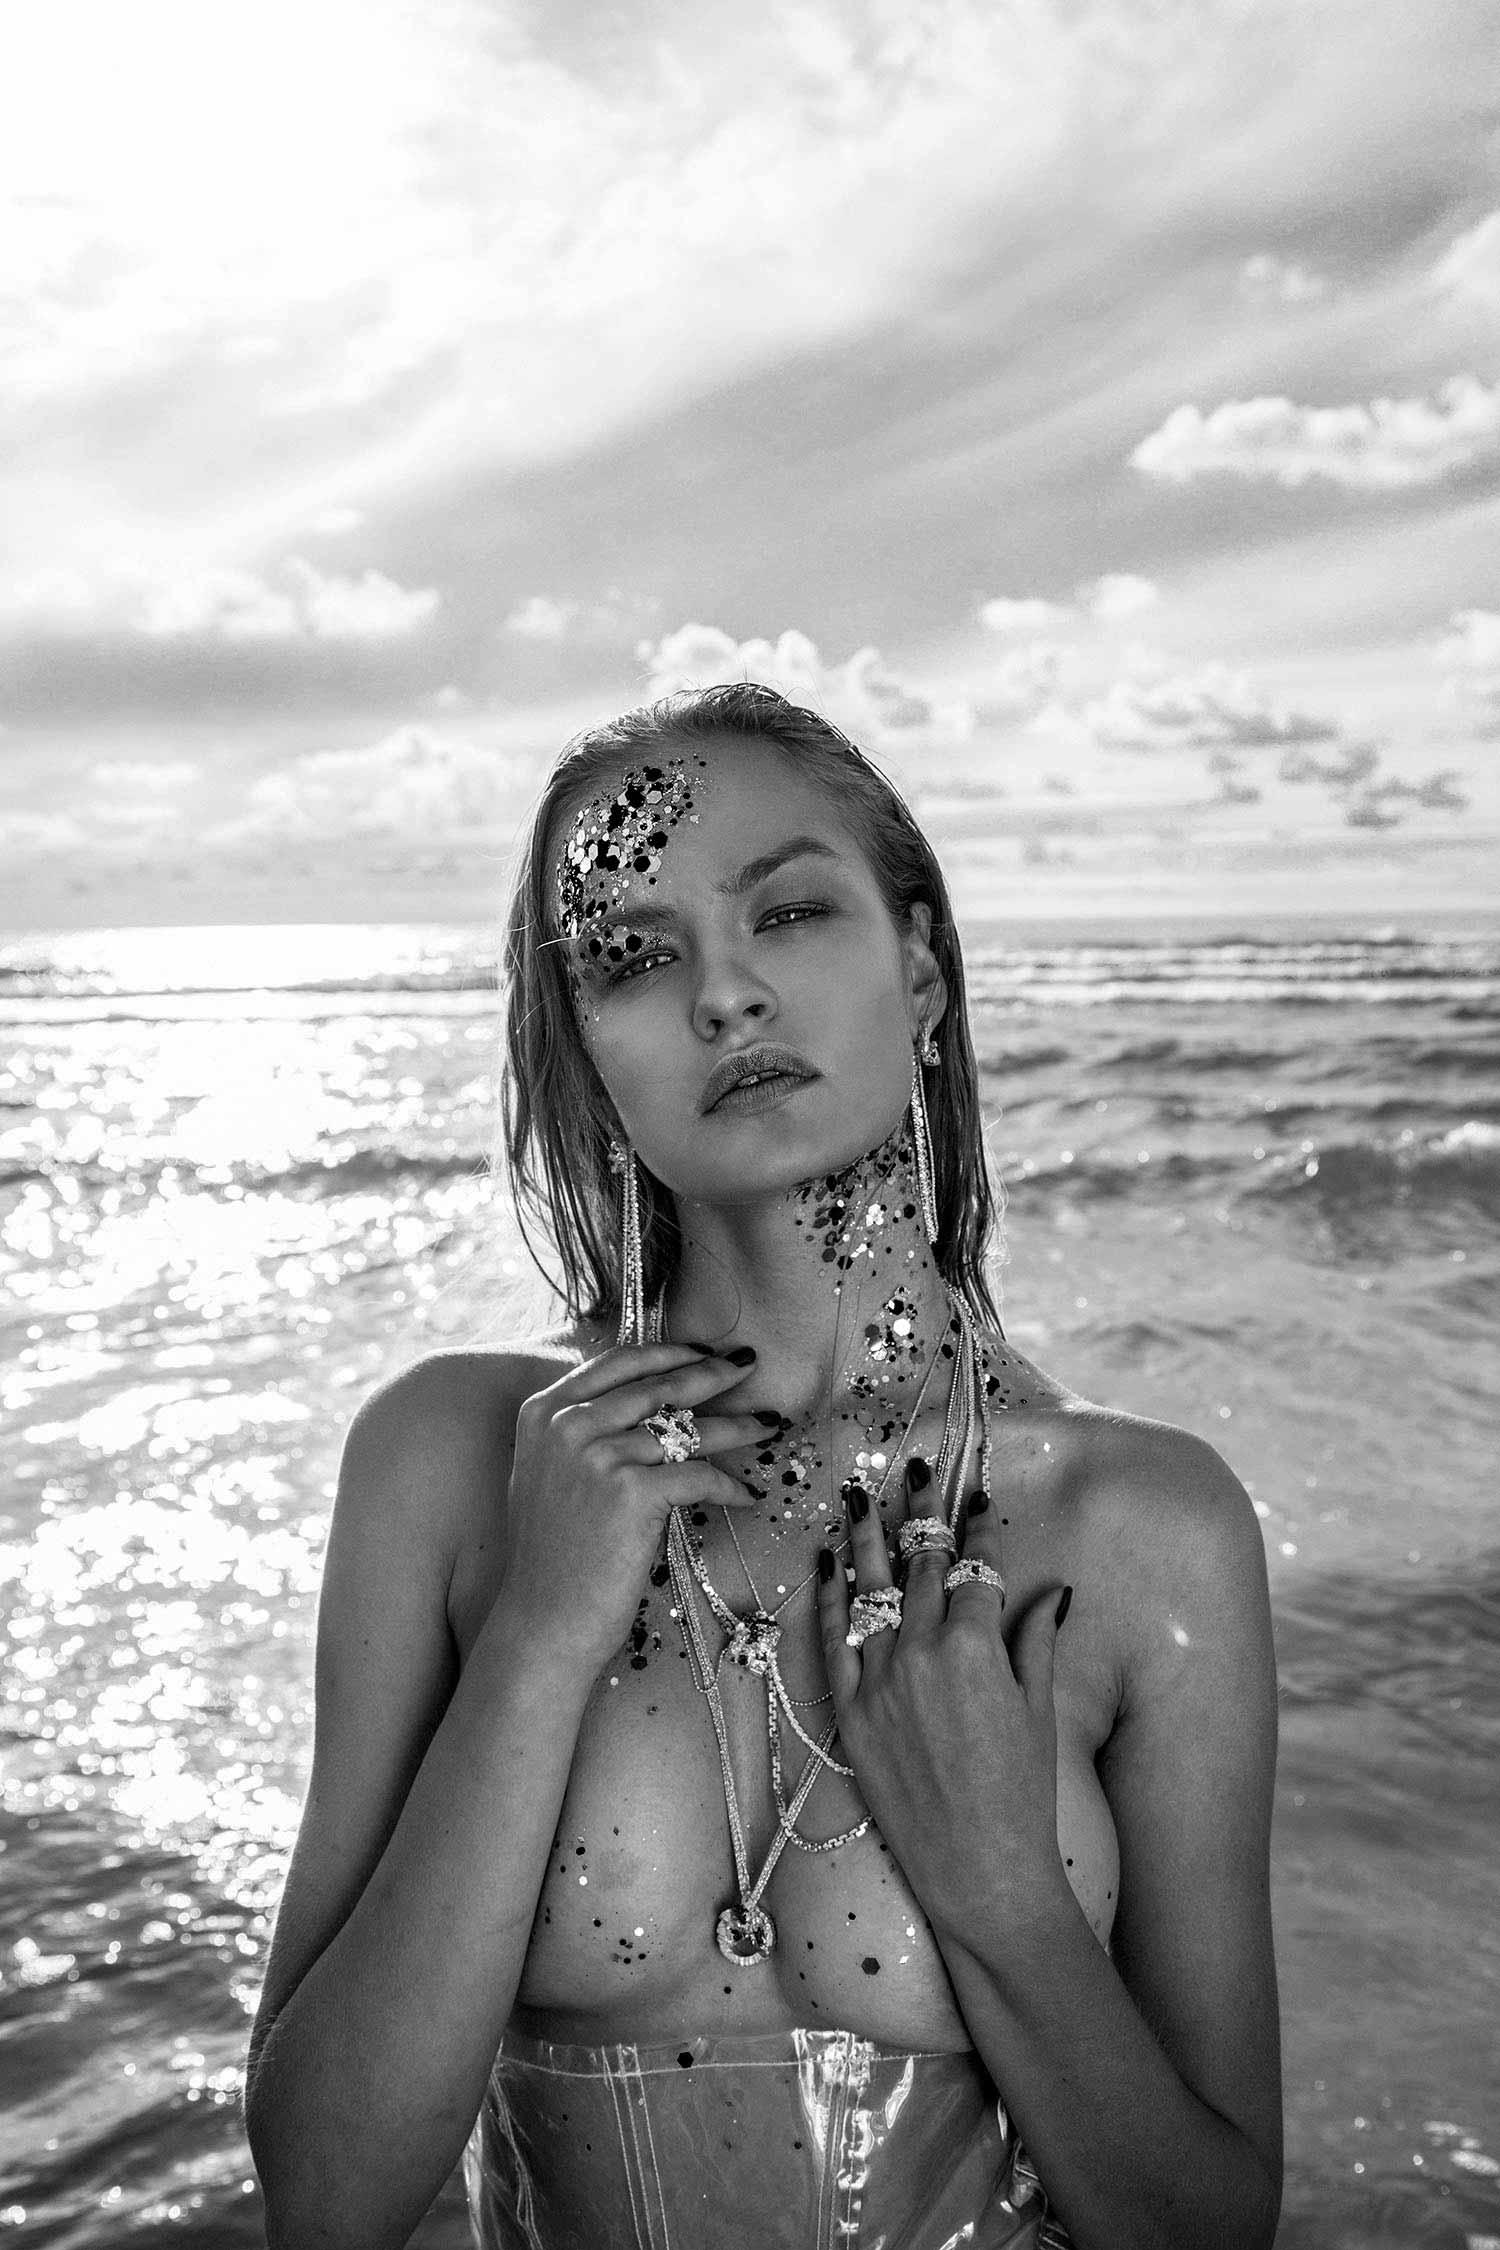 Zydrune Anomaly mermaid theme lookbook. Model wearing full set of Zydrune jewellery.